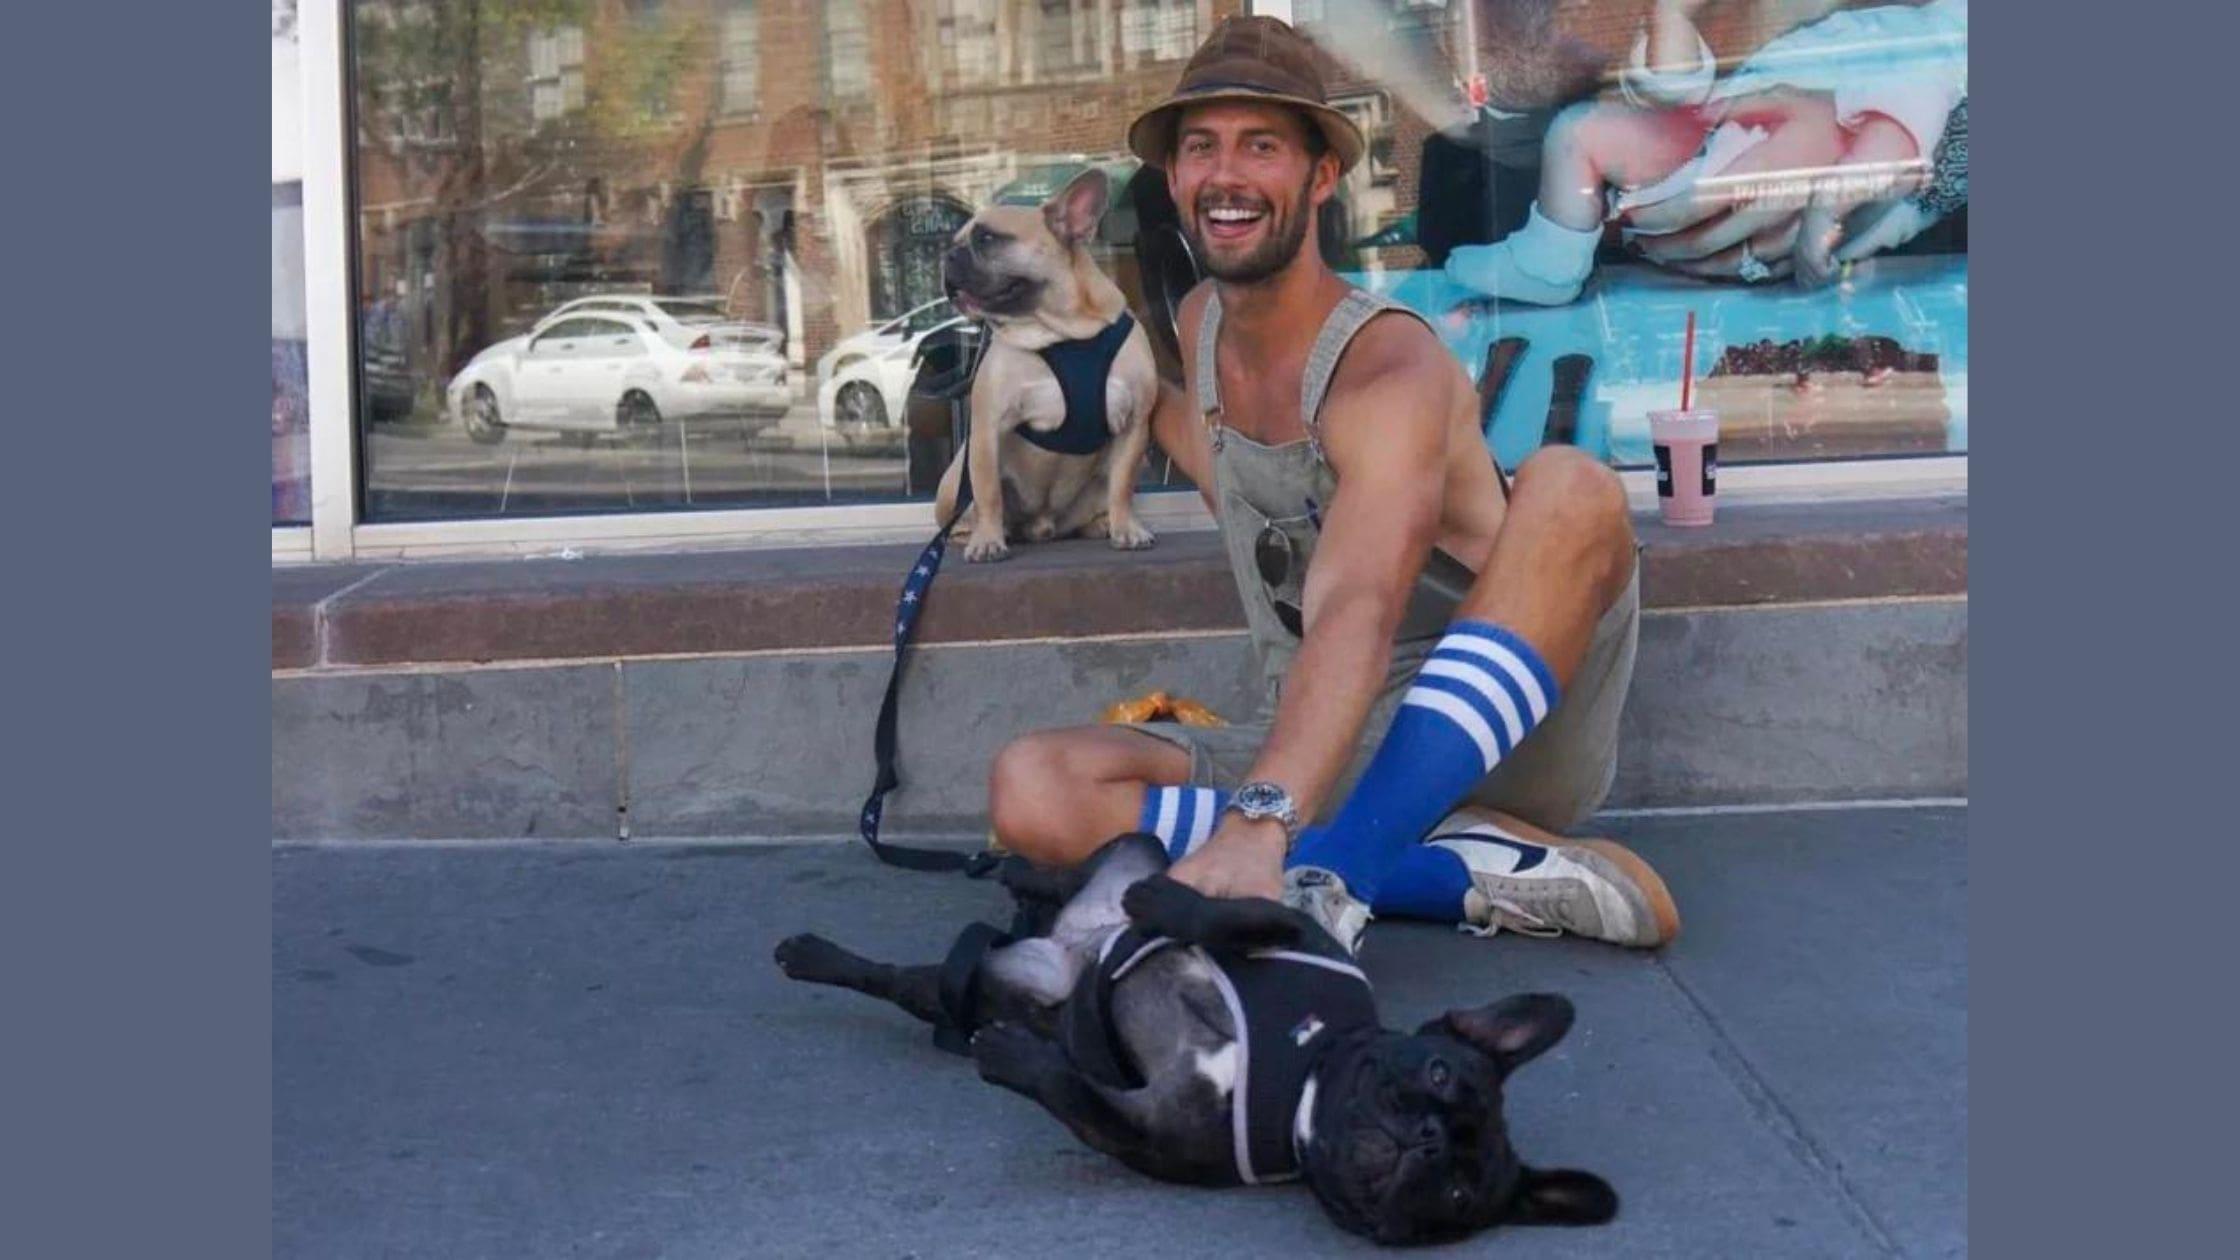 Lady Gaga's Dog Walker Asks For Financial Help